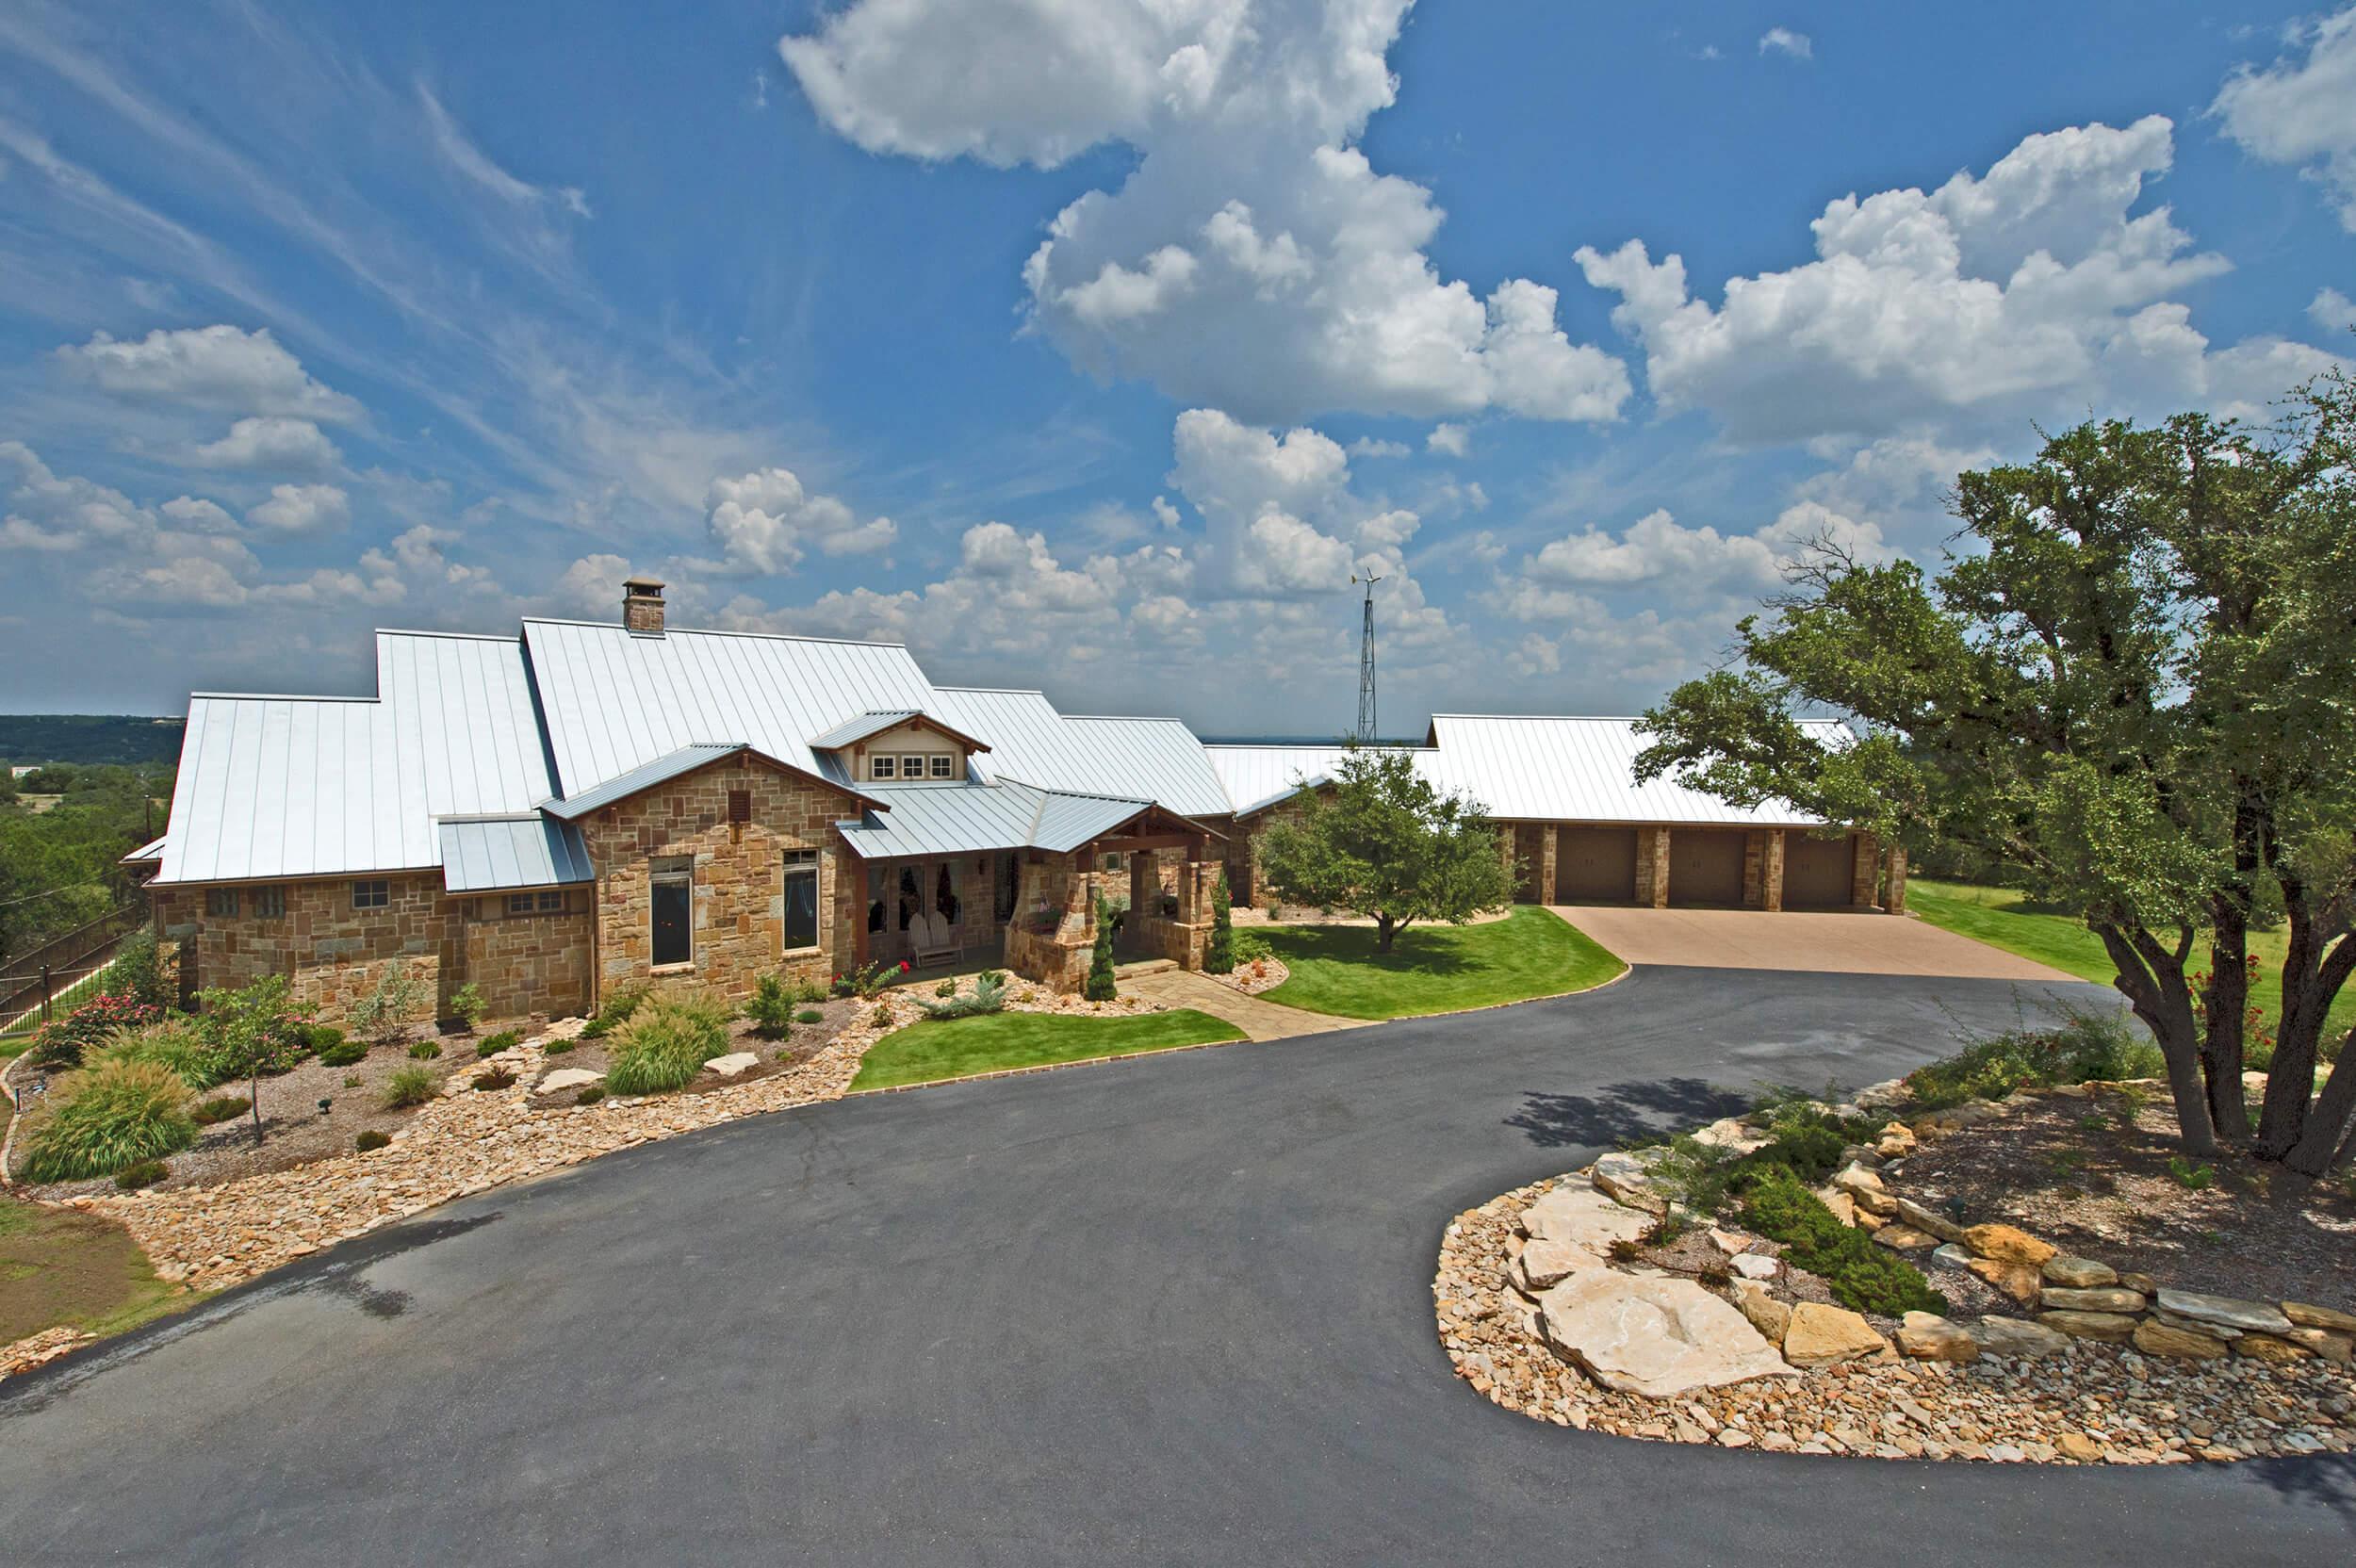 Steve Bumpas Custom Homes Ridgeview 01 Homebuilder Remodel Granbury Brazos Bend Cresson DeCordova Pecan Plantation Tolar Glen Rose Fort Worth.jpg